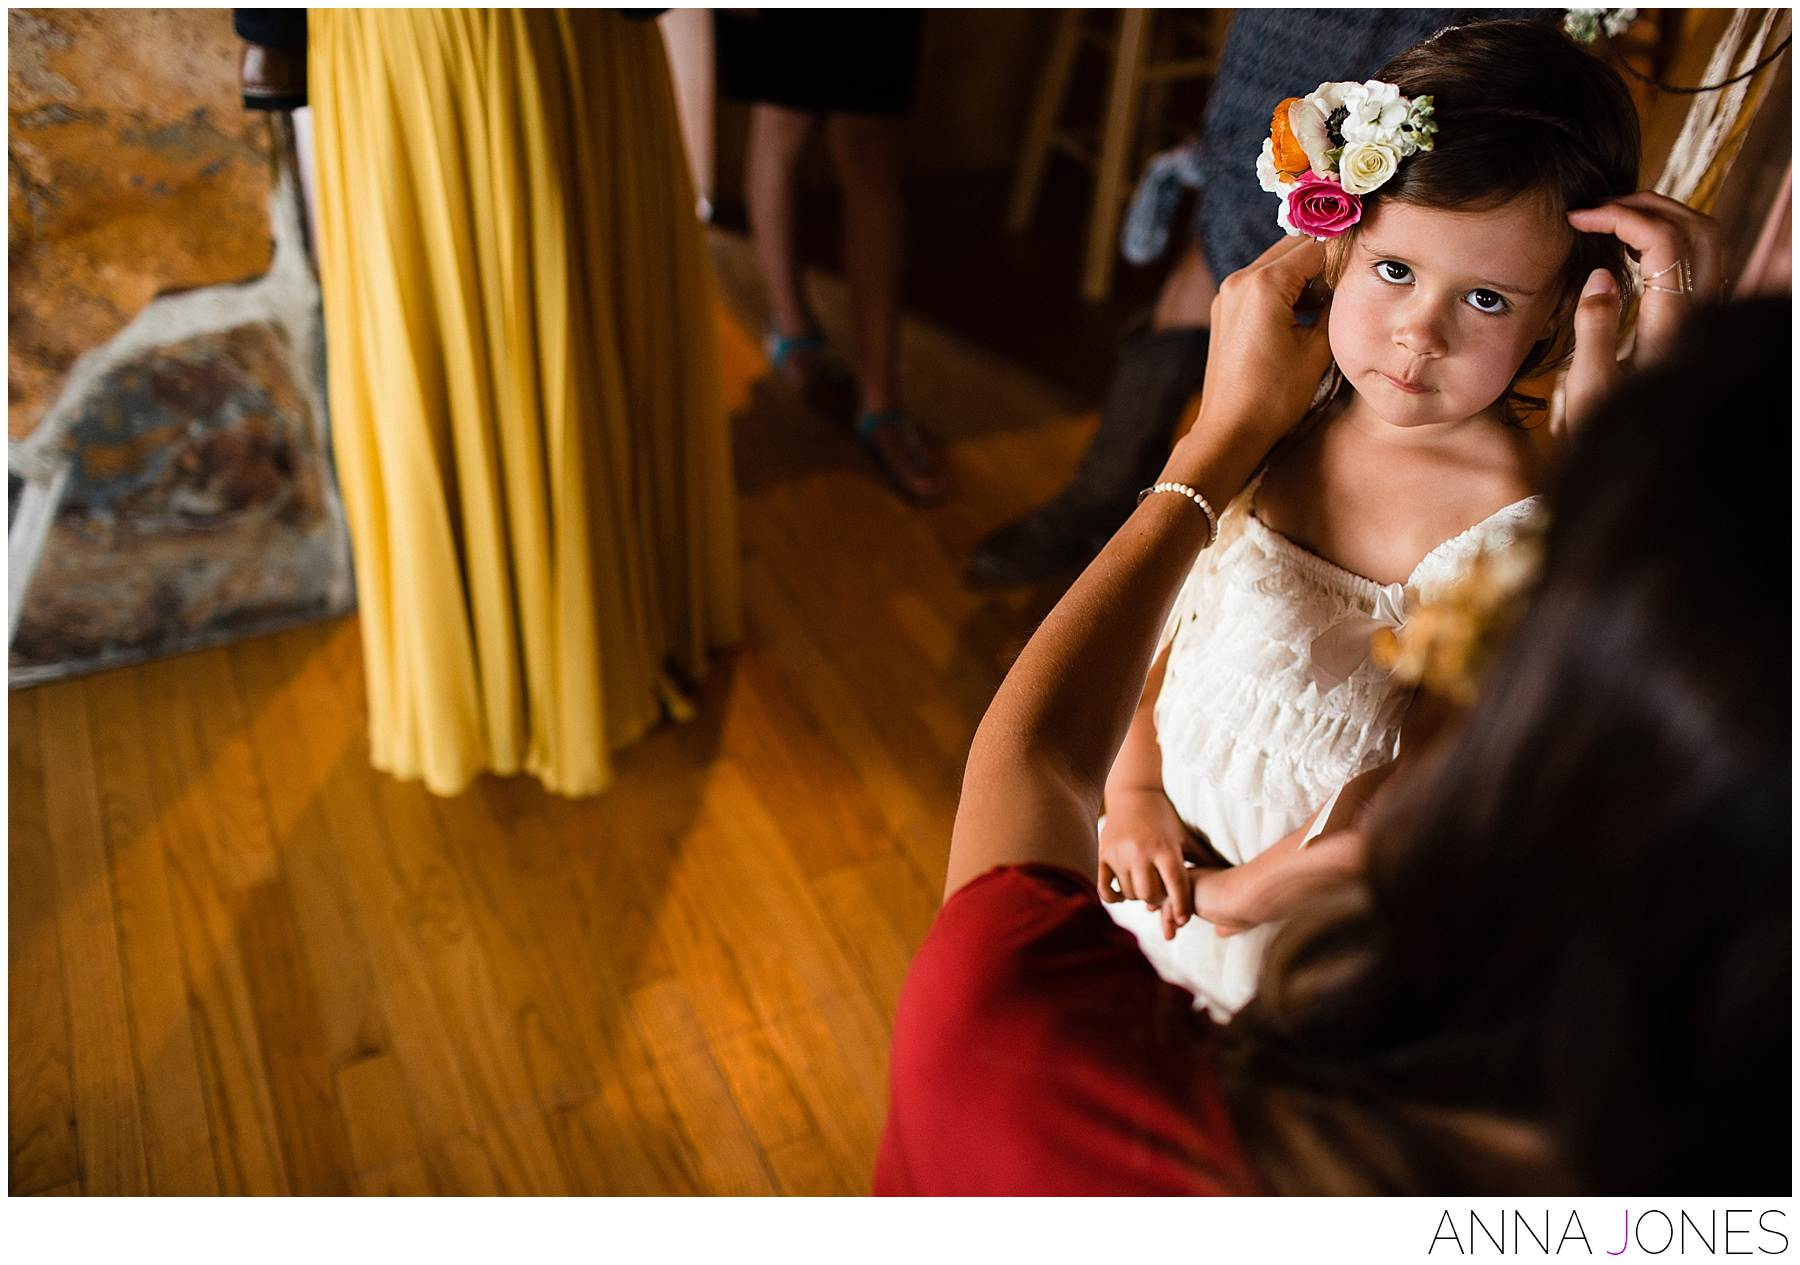 Amanda Cassel + Darius Subatis by Anna Jones Wedding Photography - www.annajon.es